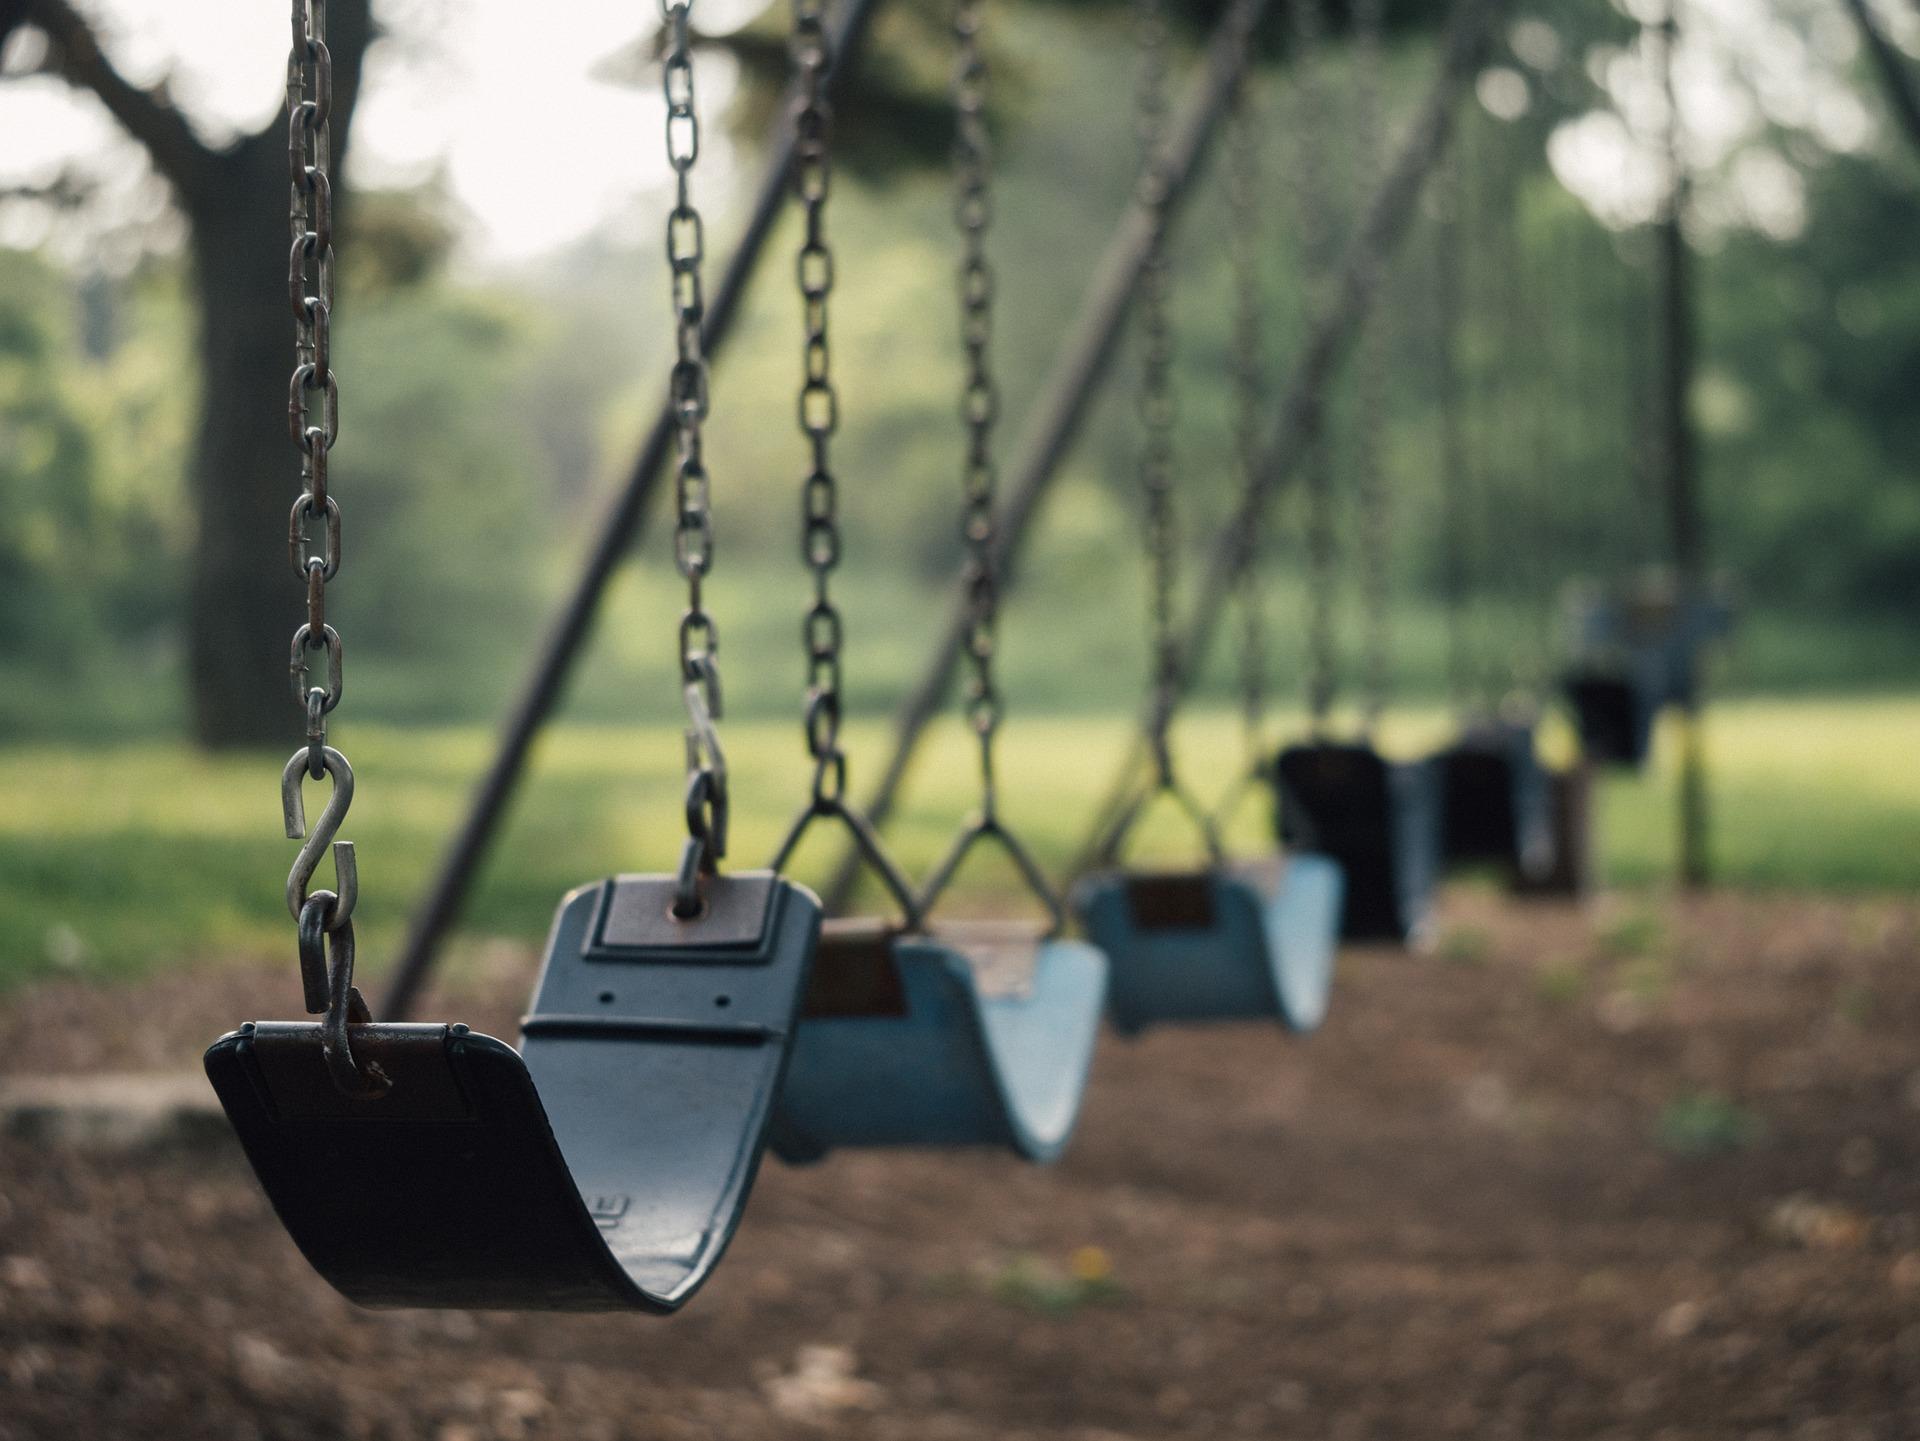 How Artificial Grass Makes Playgrounds Safer